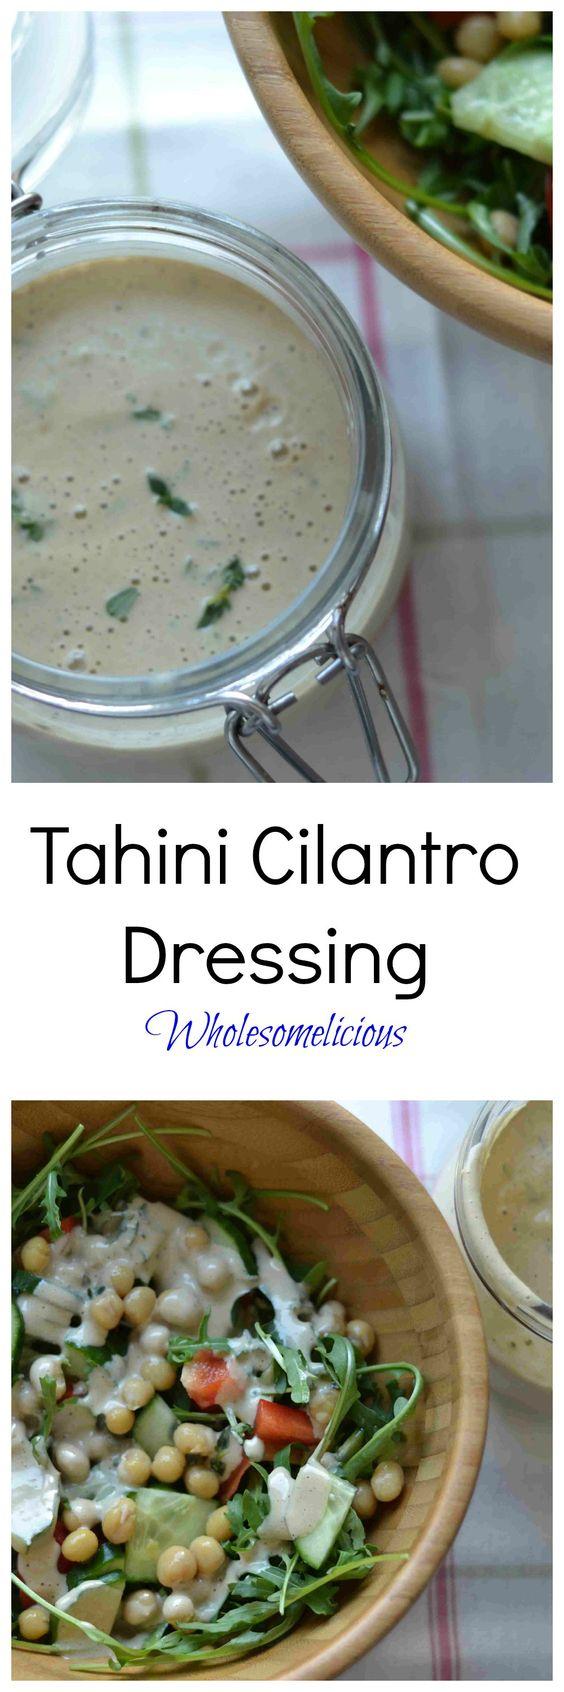 Tahini Cilantro Salad Dressing | Recipe | Tahini, Cilantro and Salad ...